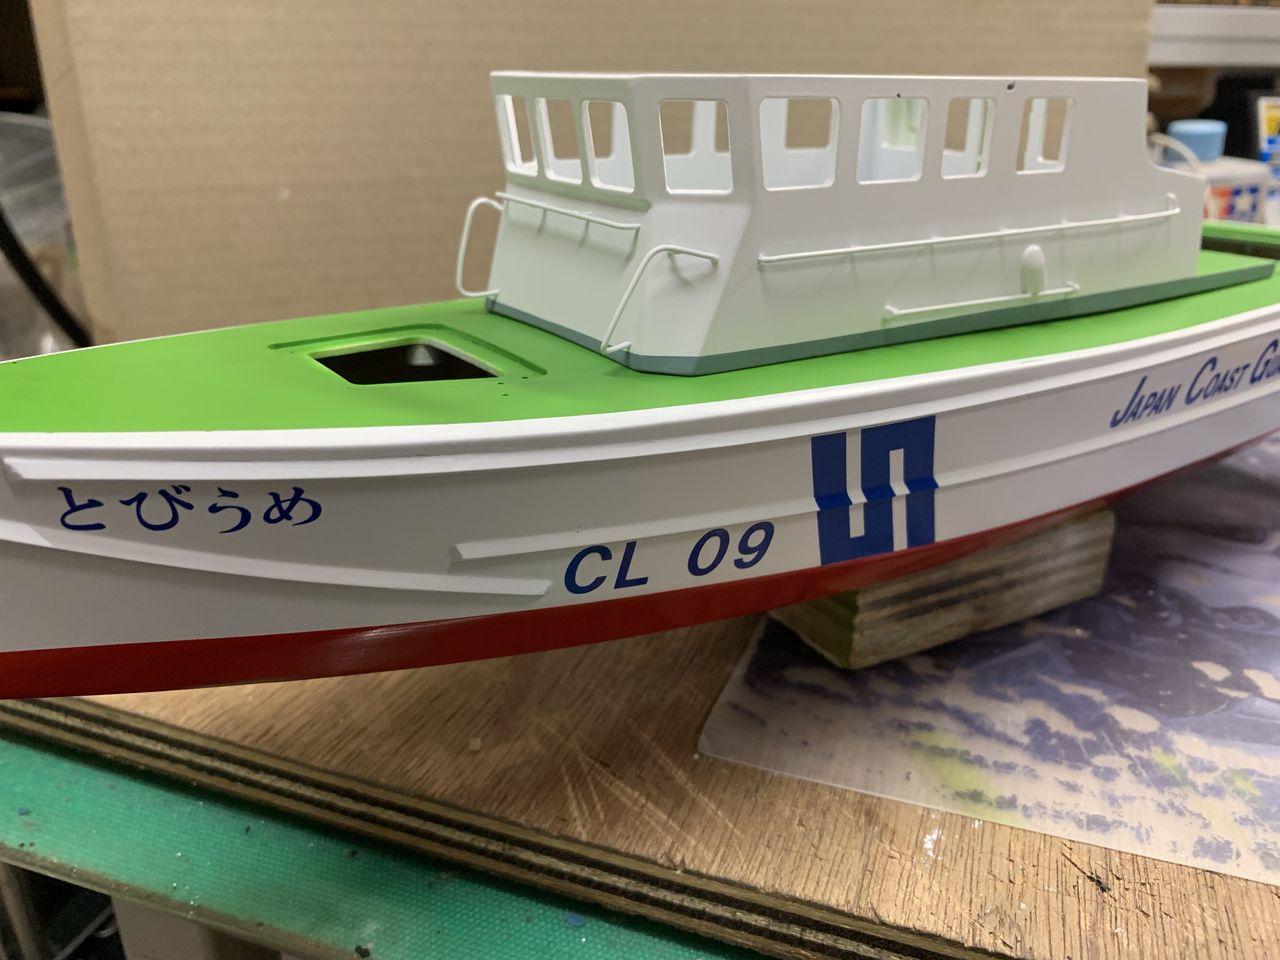 kennybenのラジコン船製作  船体完成。コメント